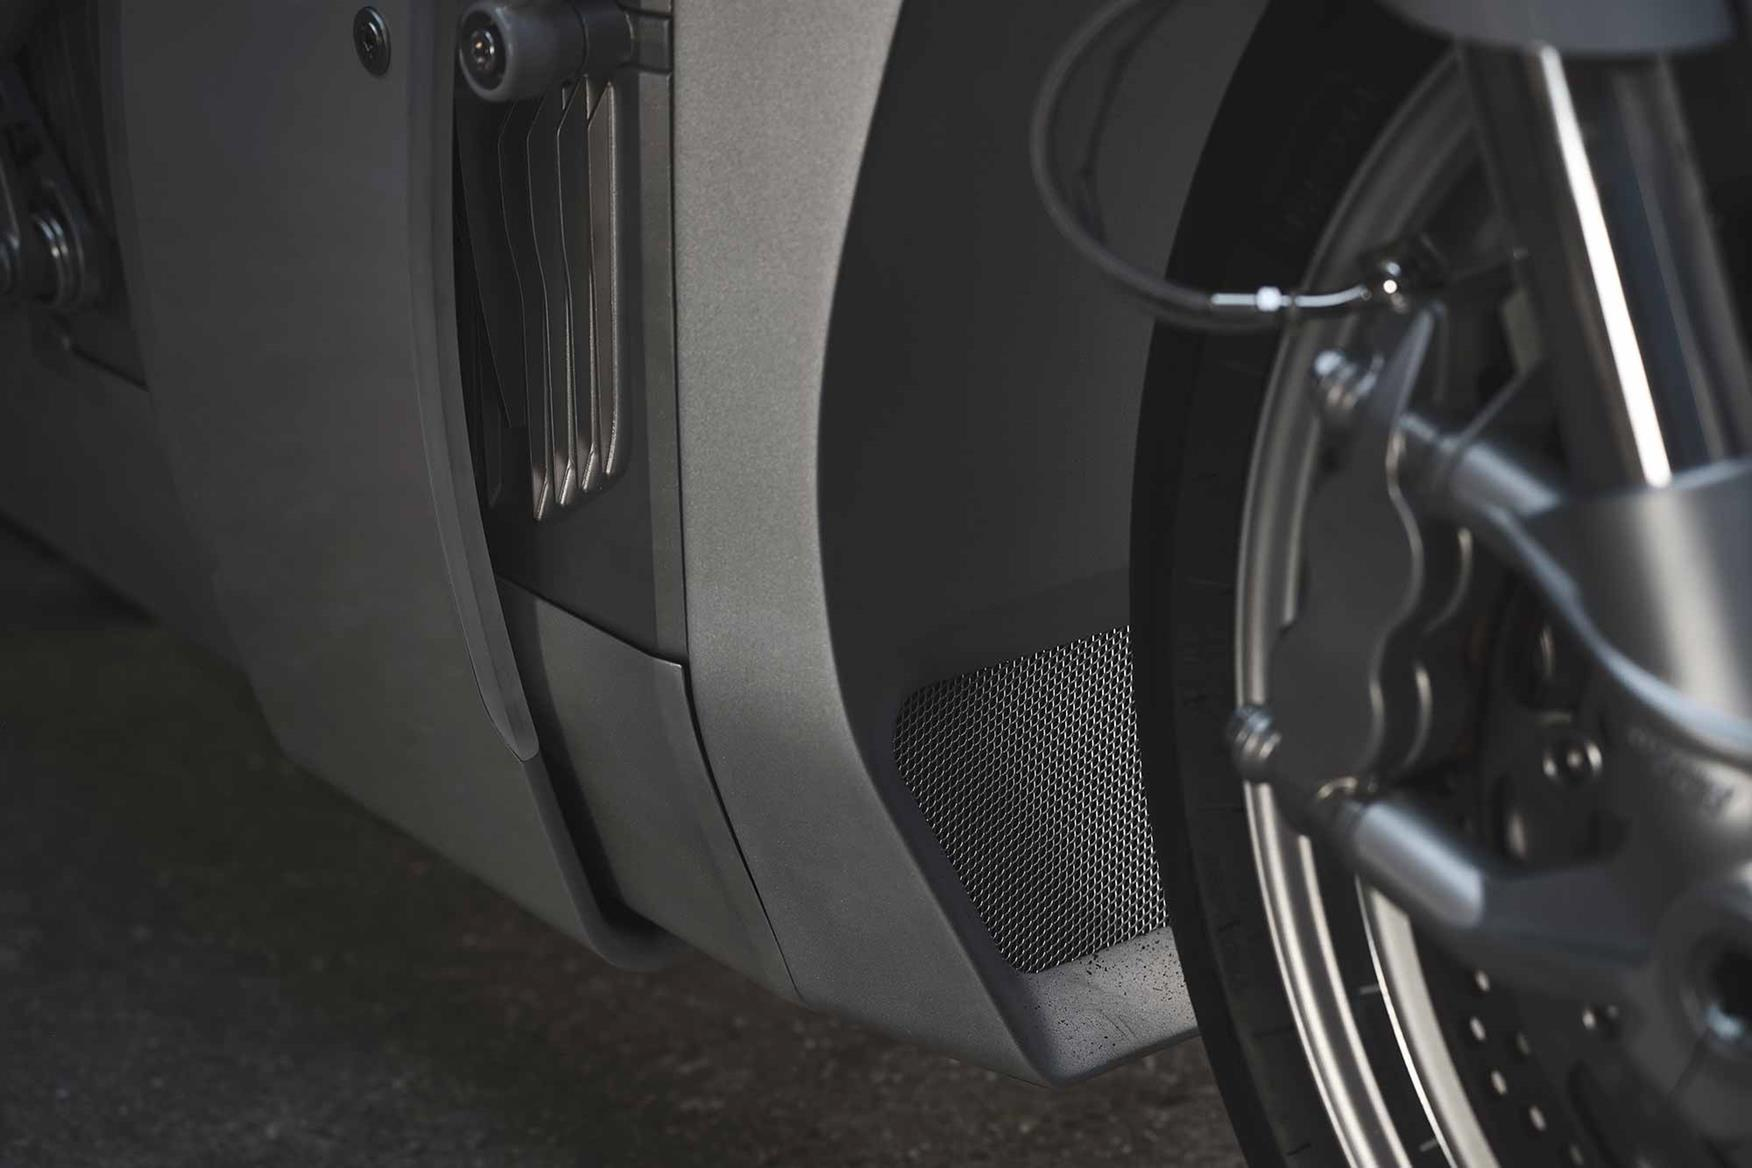 Zero XP front brake caliper. Credit: Ludovic Robert